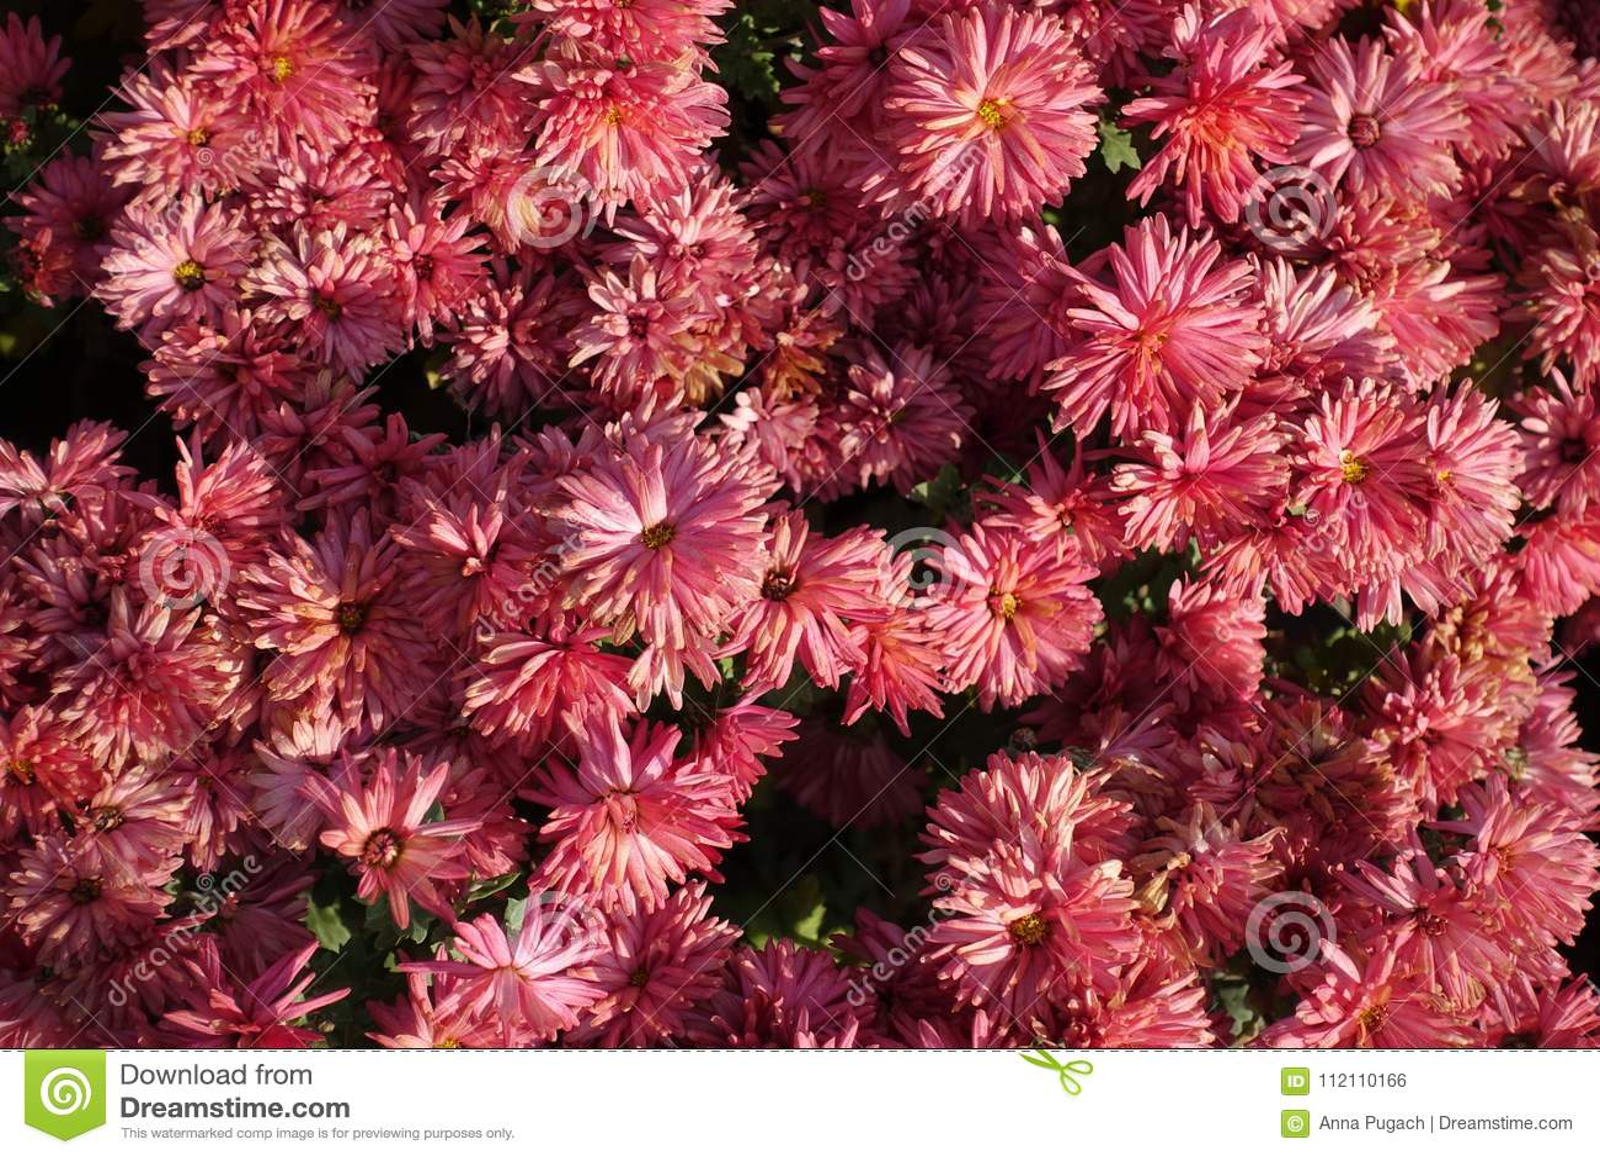 Salmon Pink Flowers Of Chrysanthemum Morifolium Stock Photo - Image ...